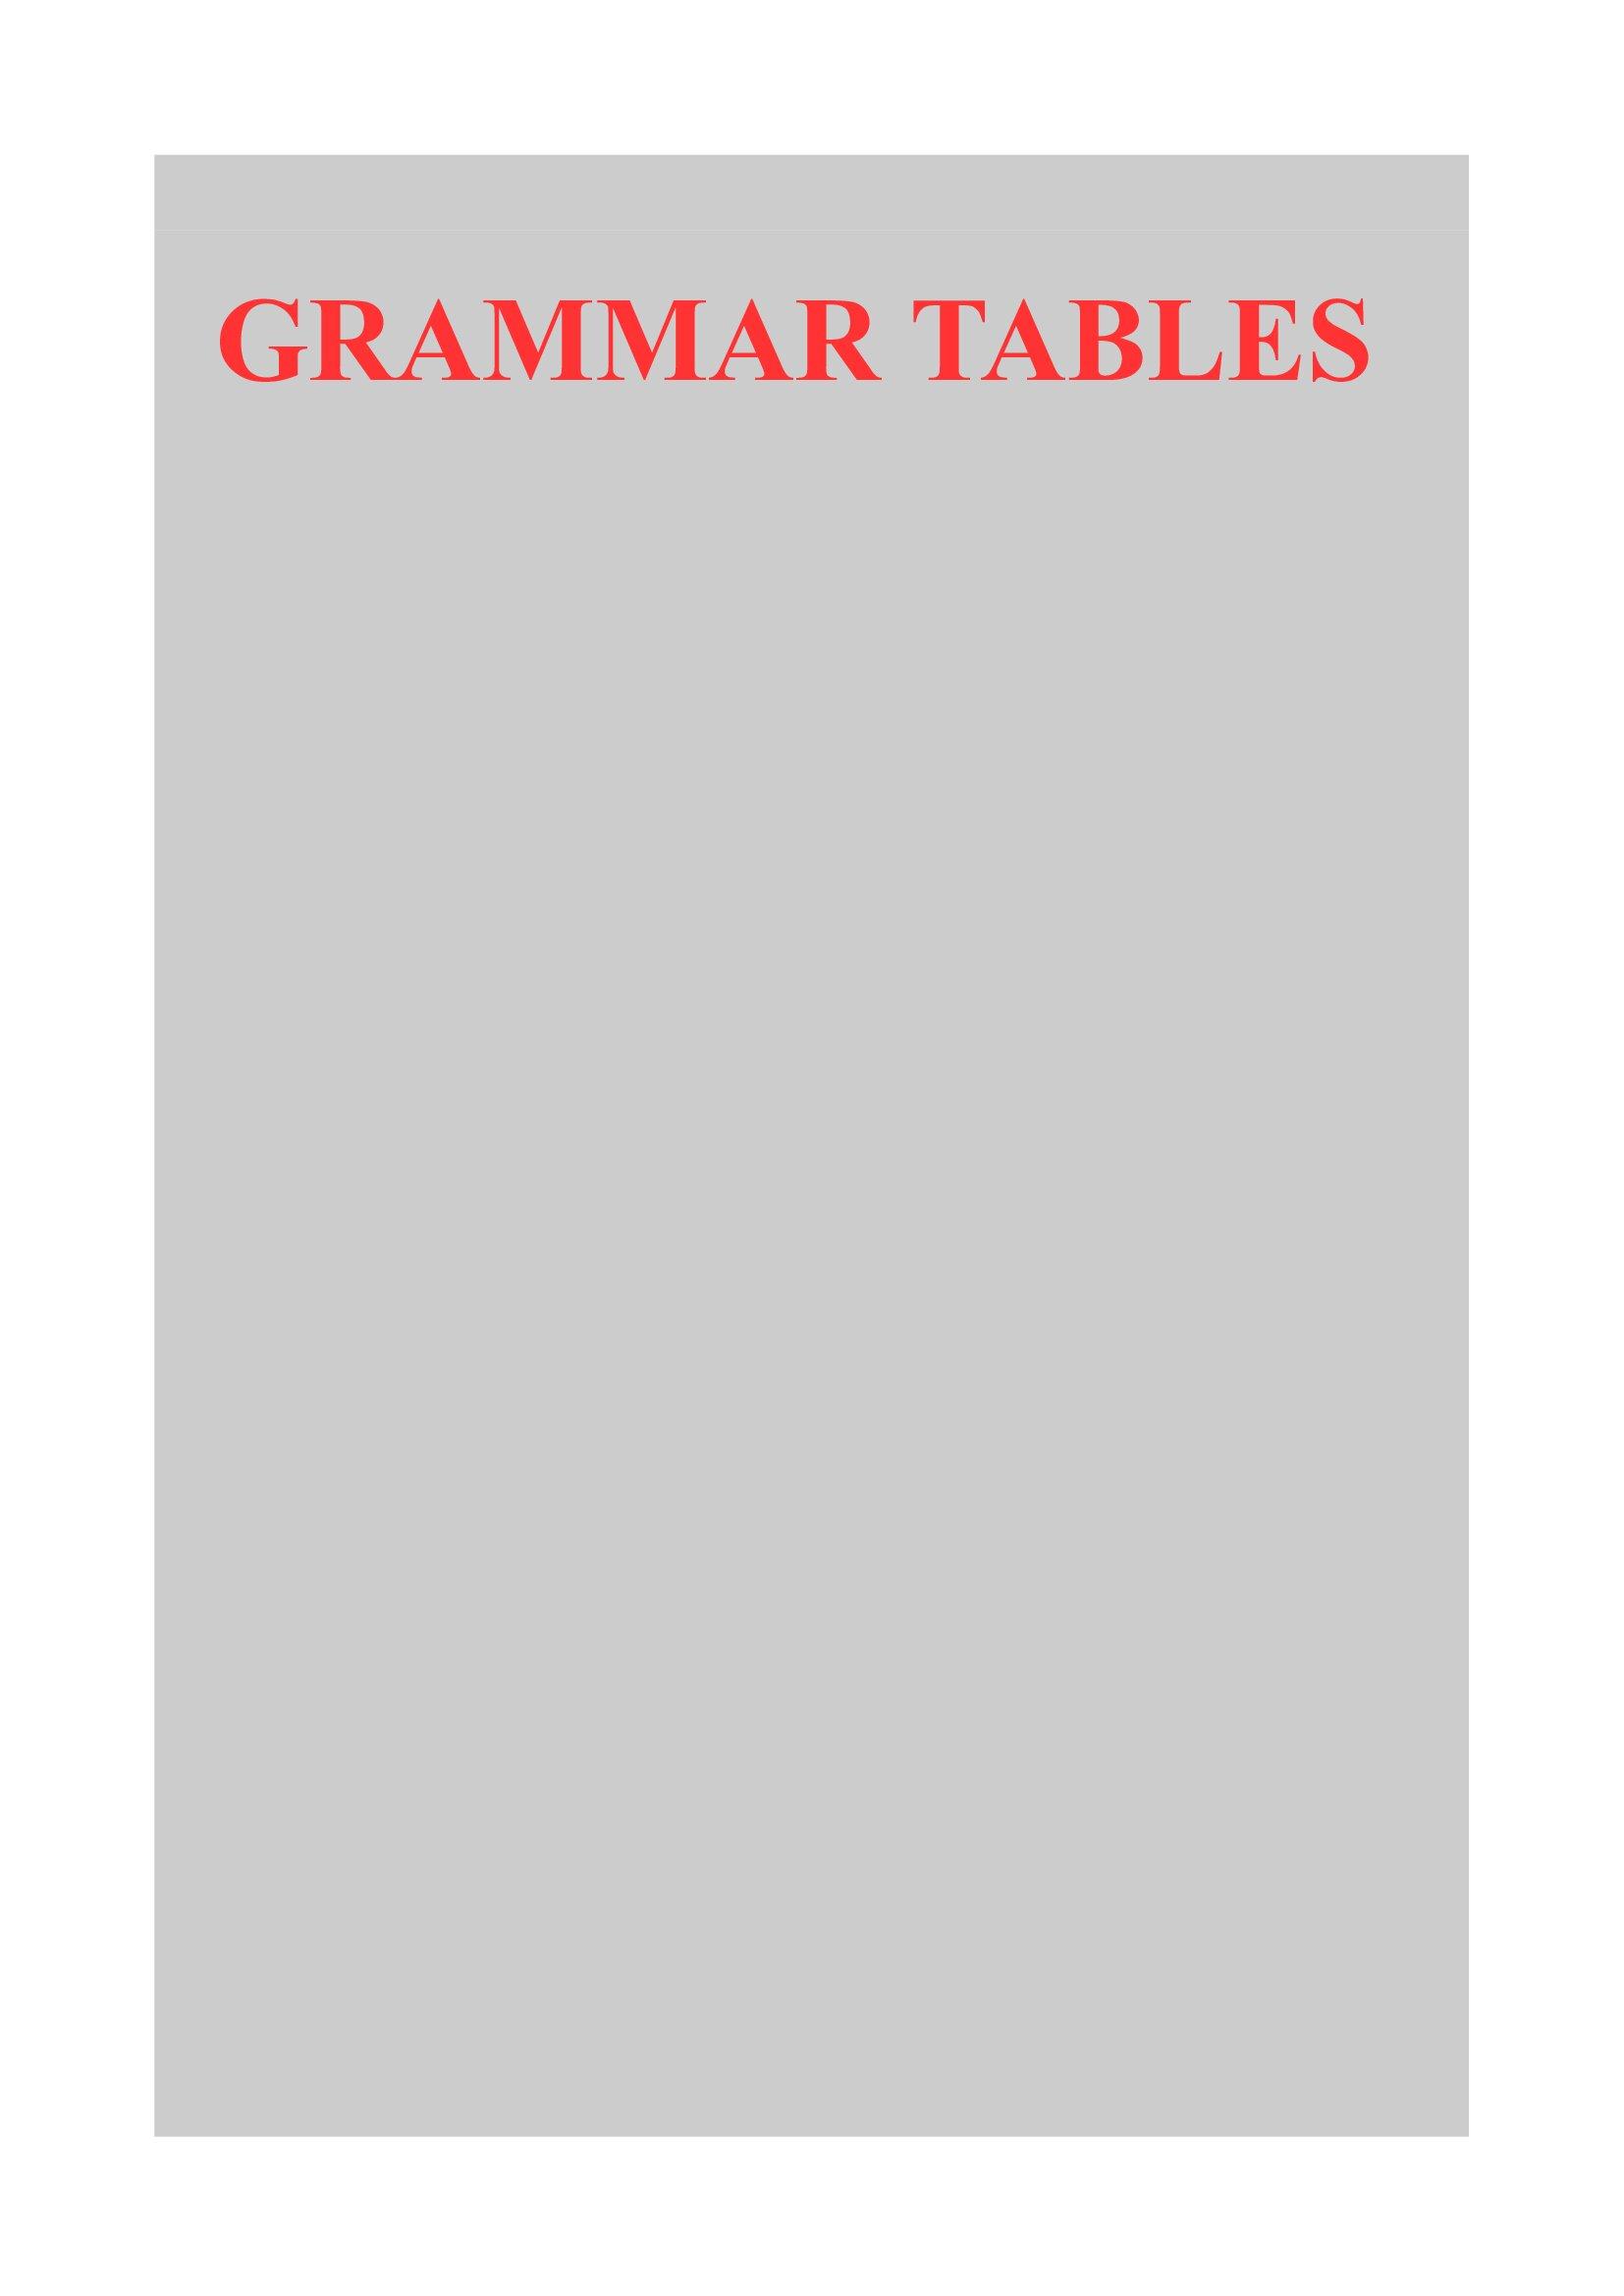 Grammar Tables: Declination of Nouns, Adjectives, Pronouns